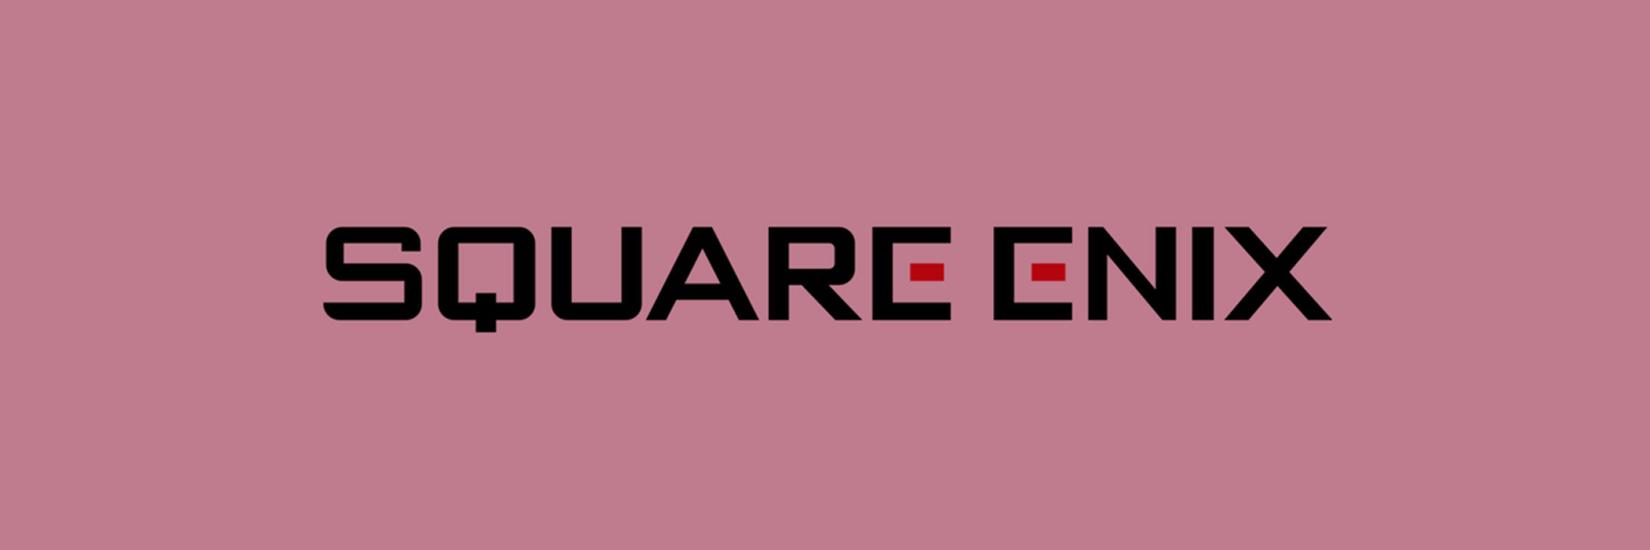 Resumen de la conferencia de Square Enix #SquarePug #E32019